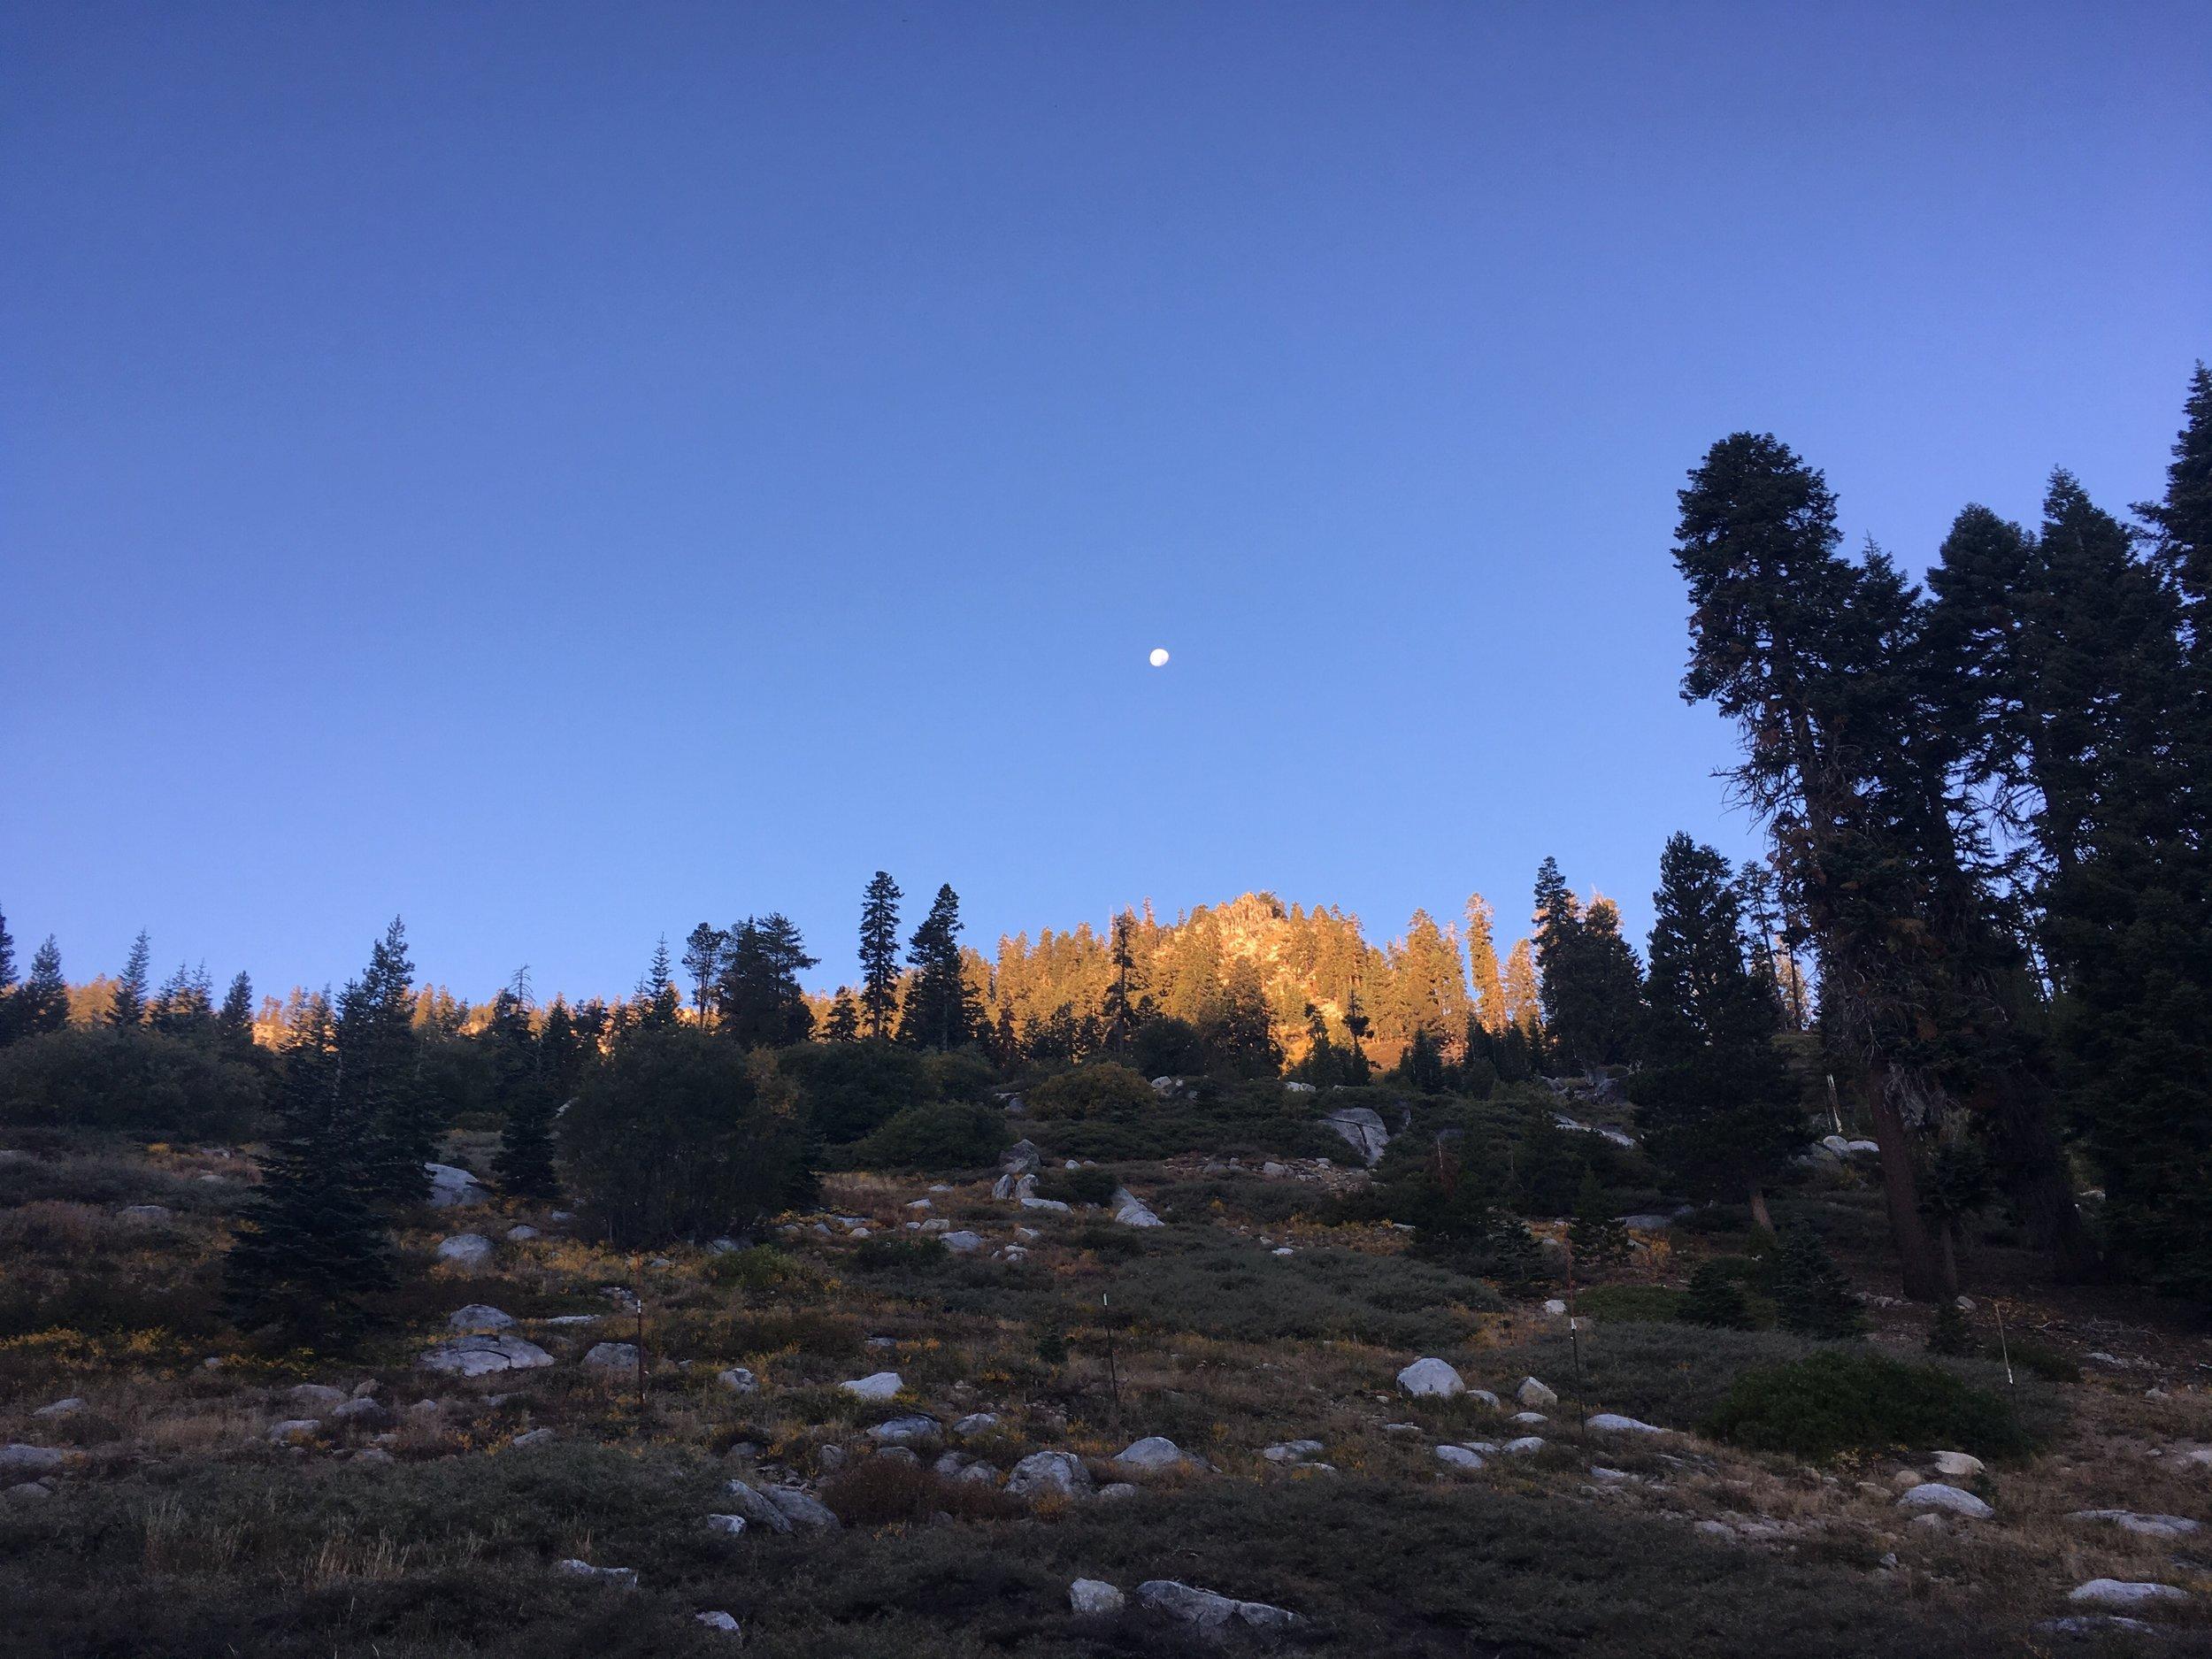 Morning light near Echo Summit with a nearly full moon.